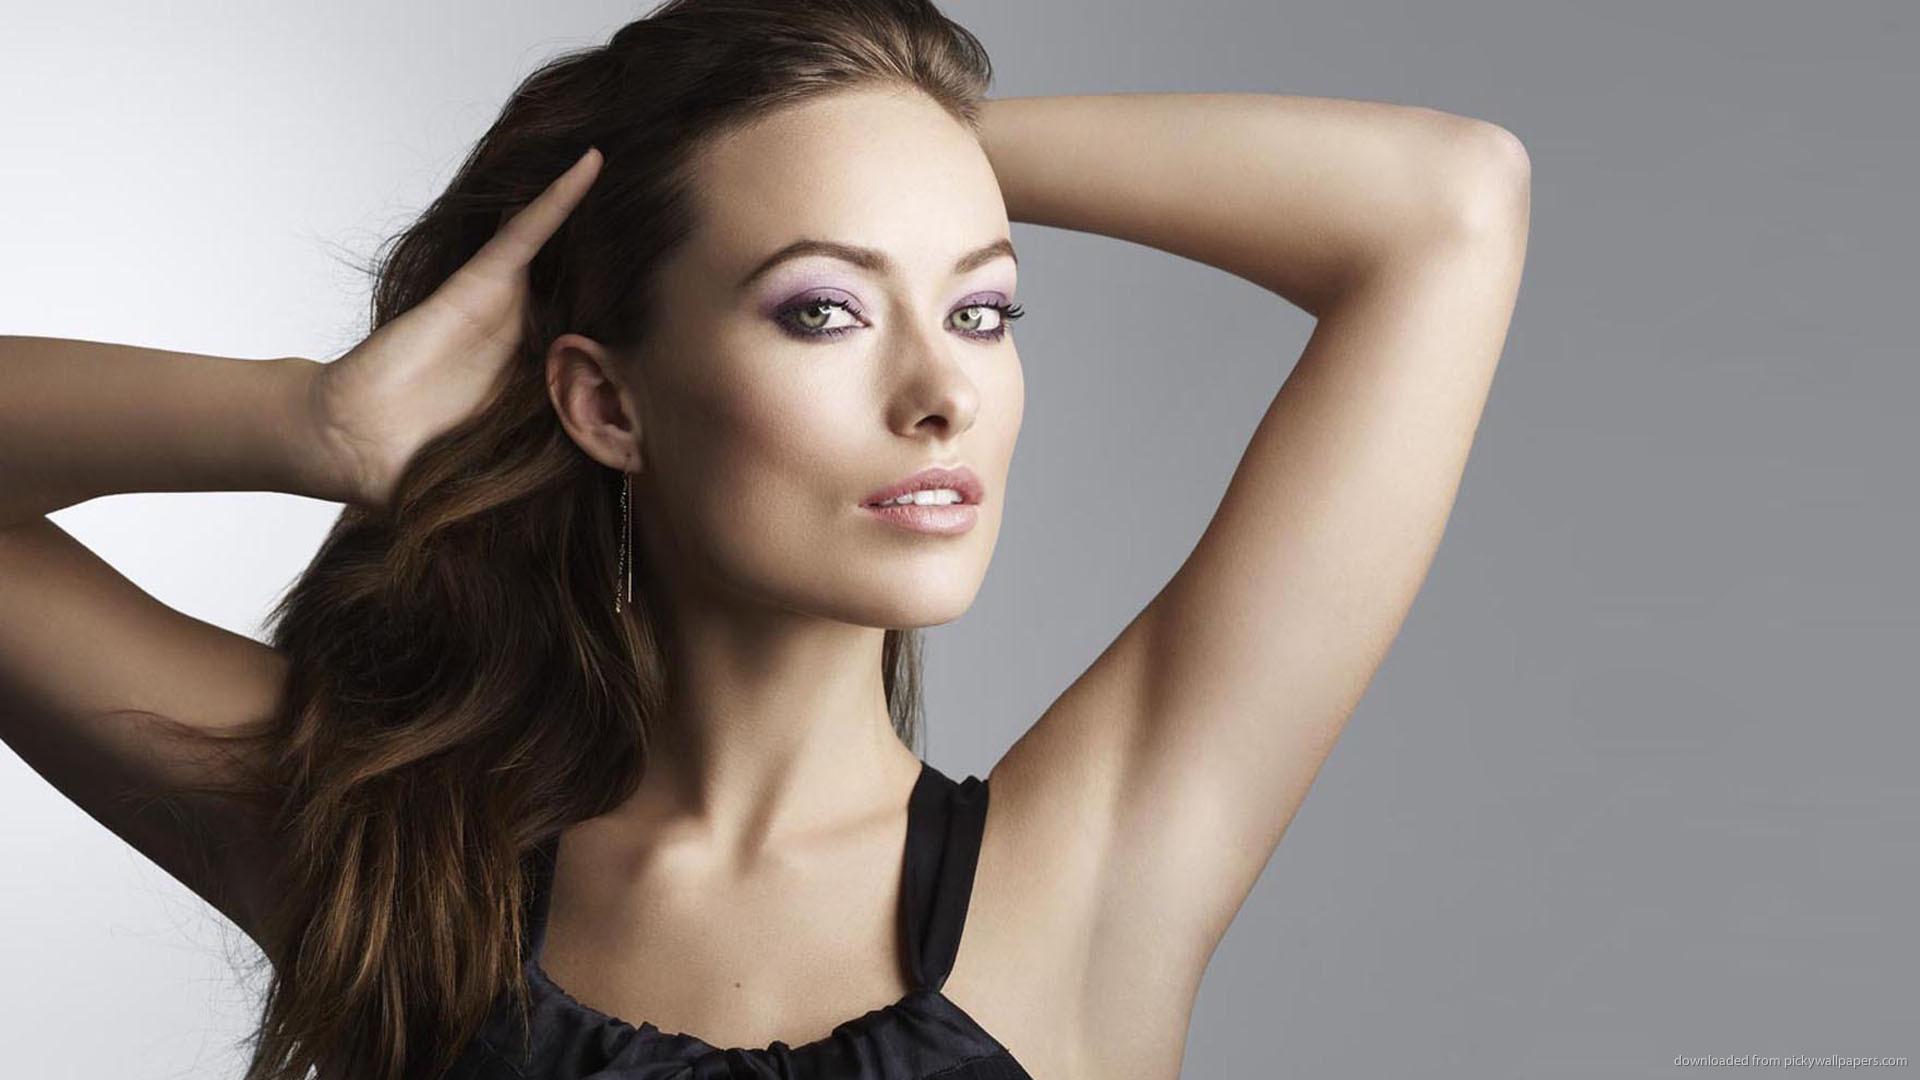 olivia-wilde-bare-armpit